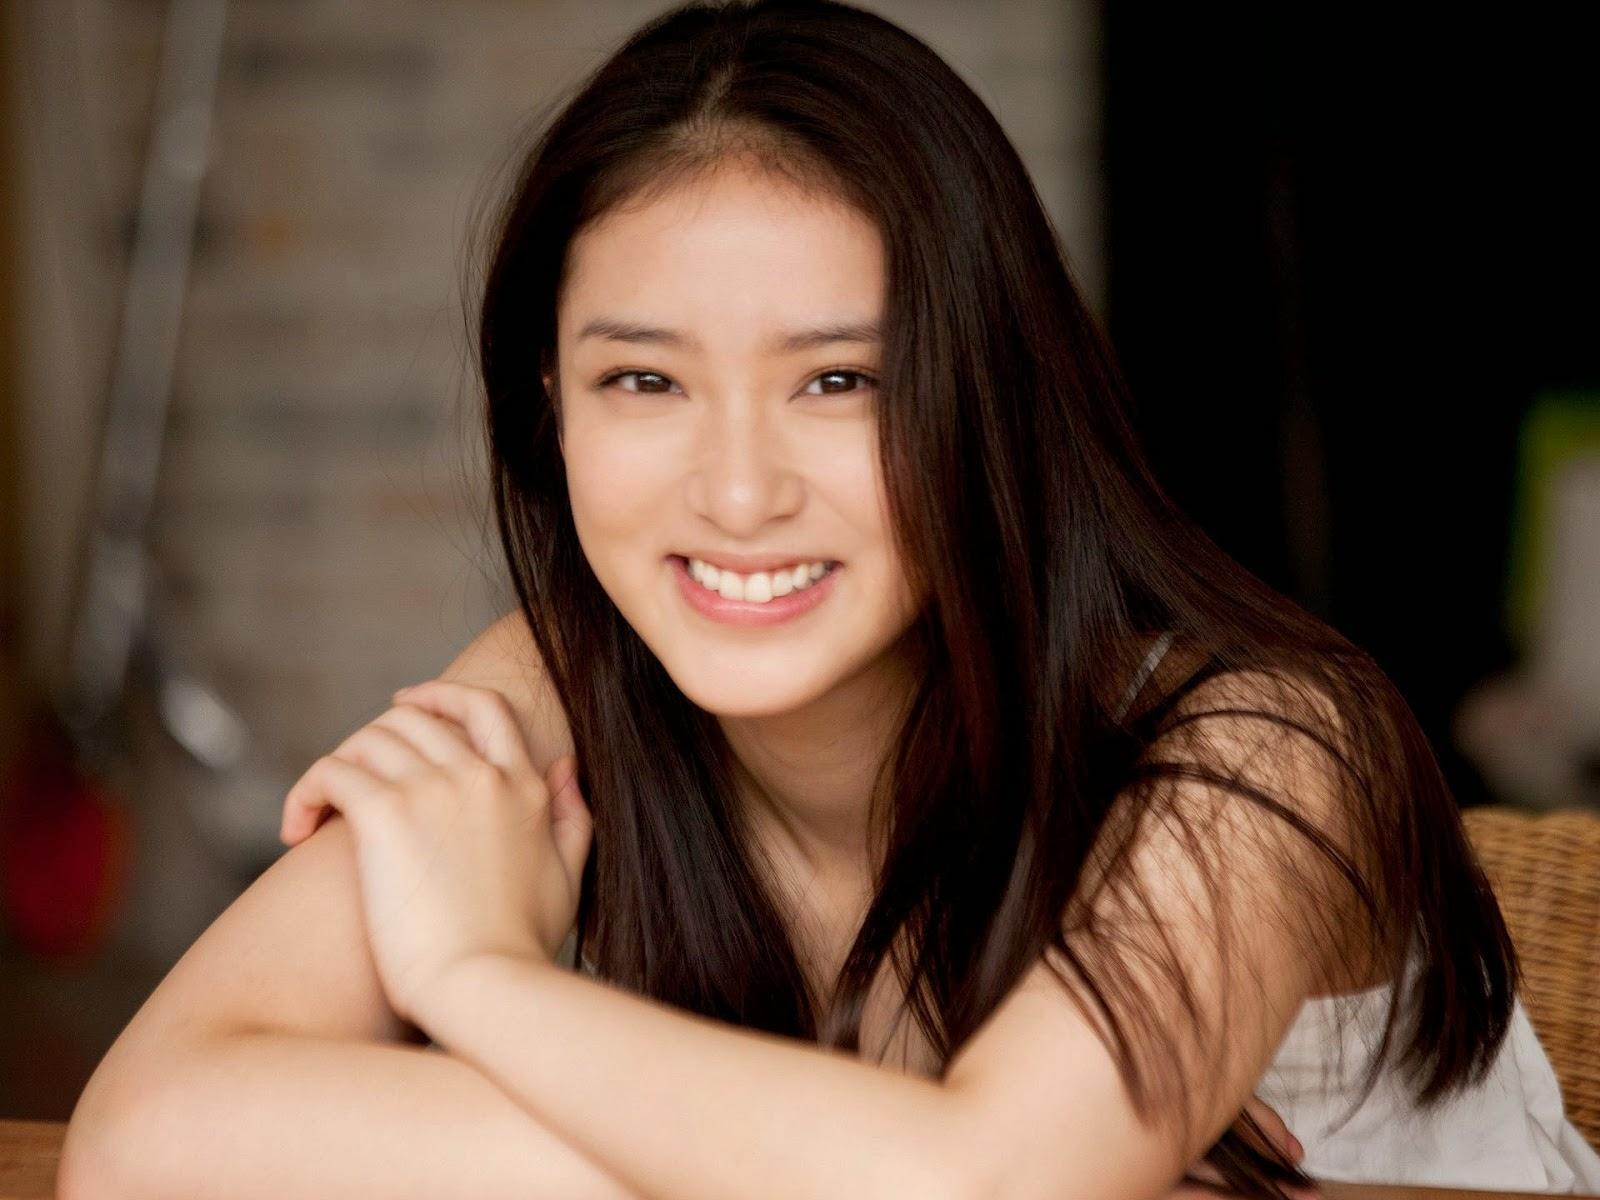 japanese actress model - photo #41